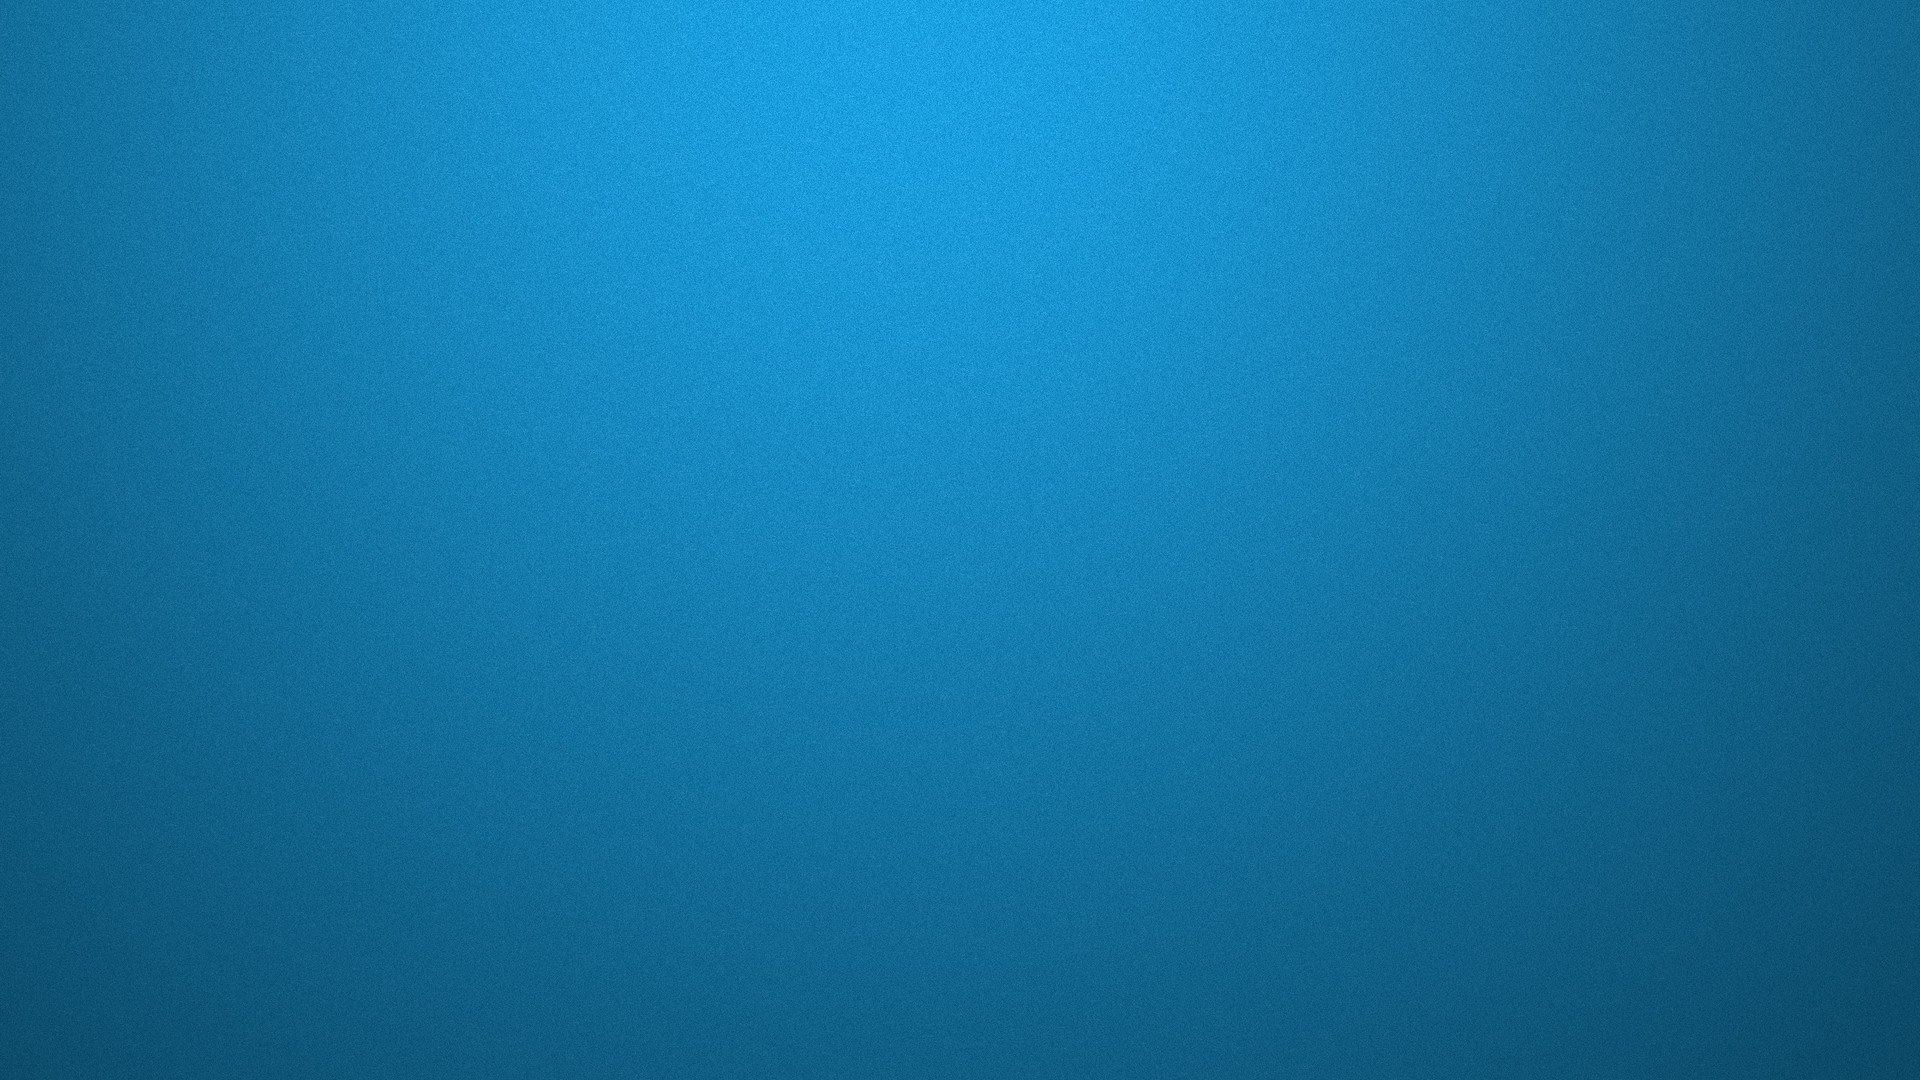 Plain Blue Download Wallpaper